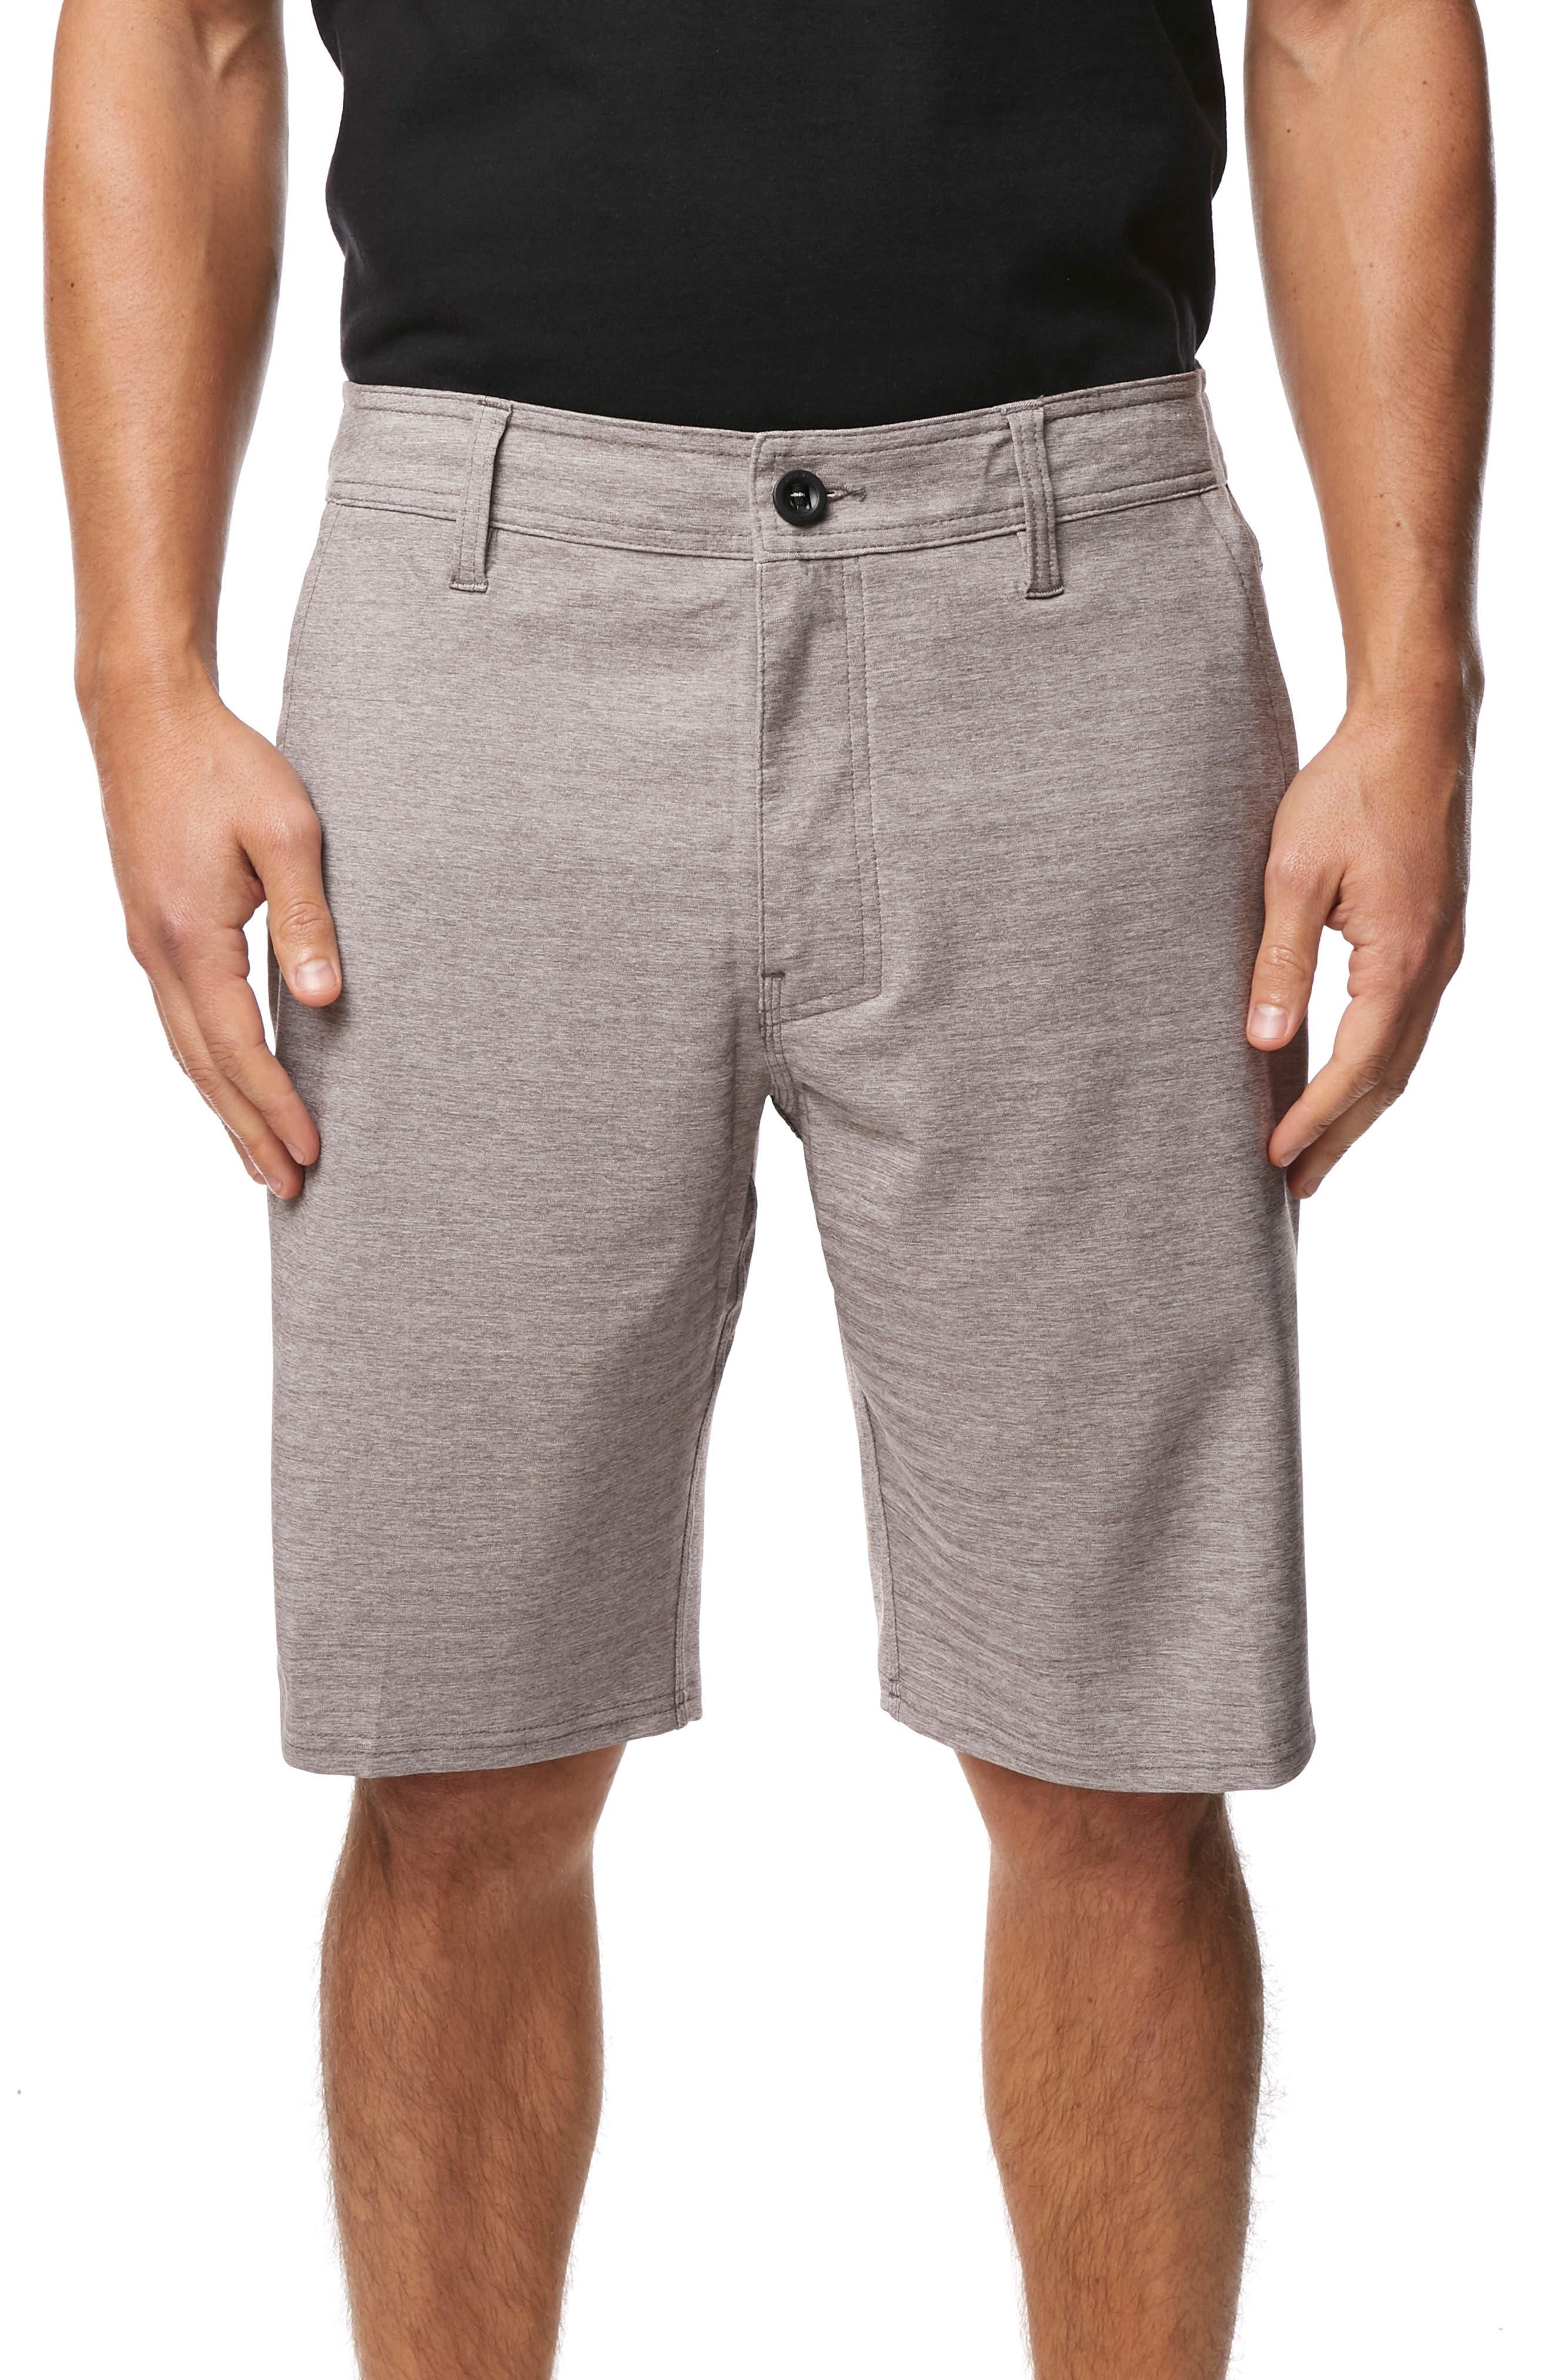 O'NEILL, Locked Herringbone Hybrid Shorts, Main thumbnail 1, color, GUN METAL